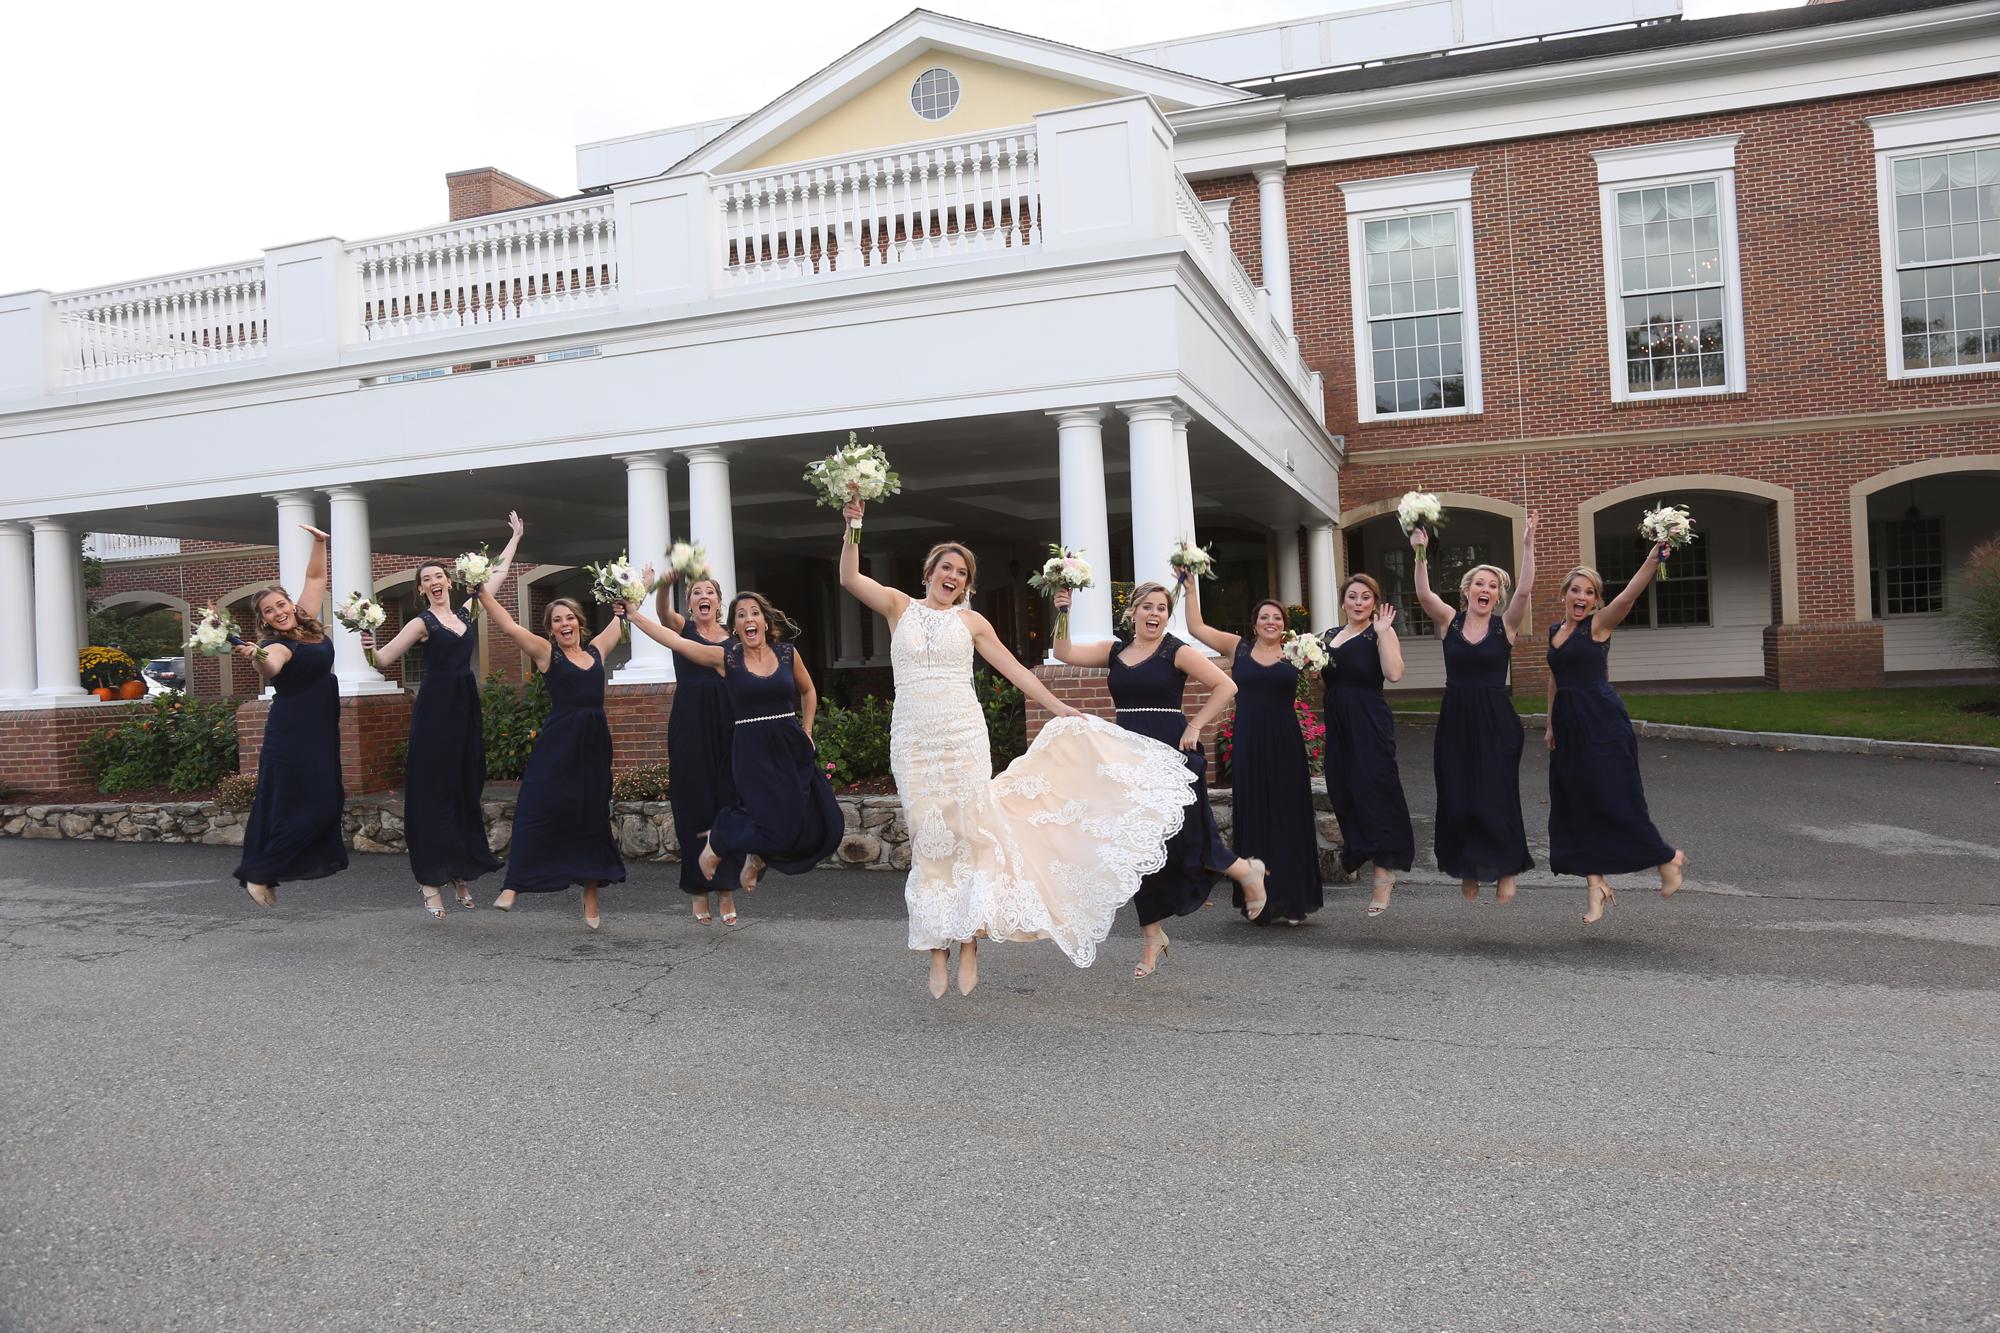 Bridesmaids jumping Destination wedding in New England